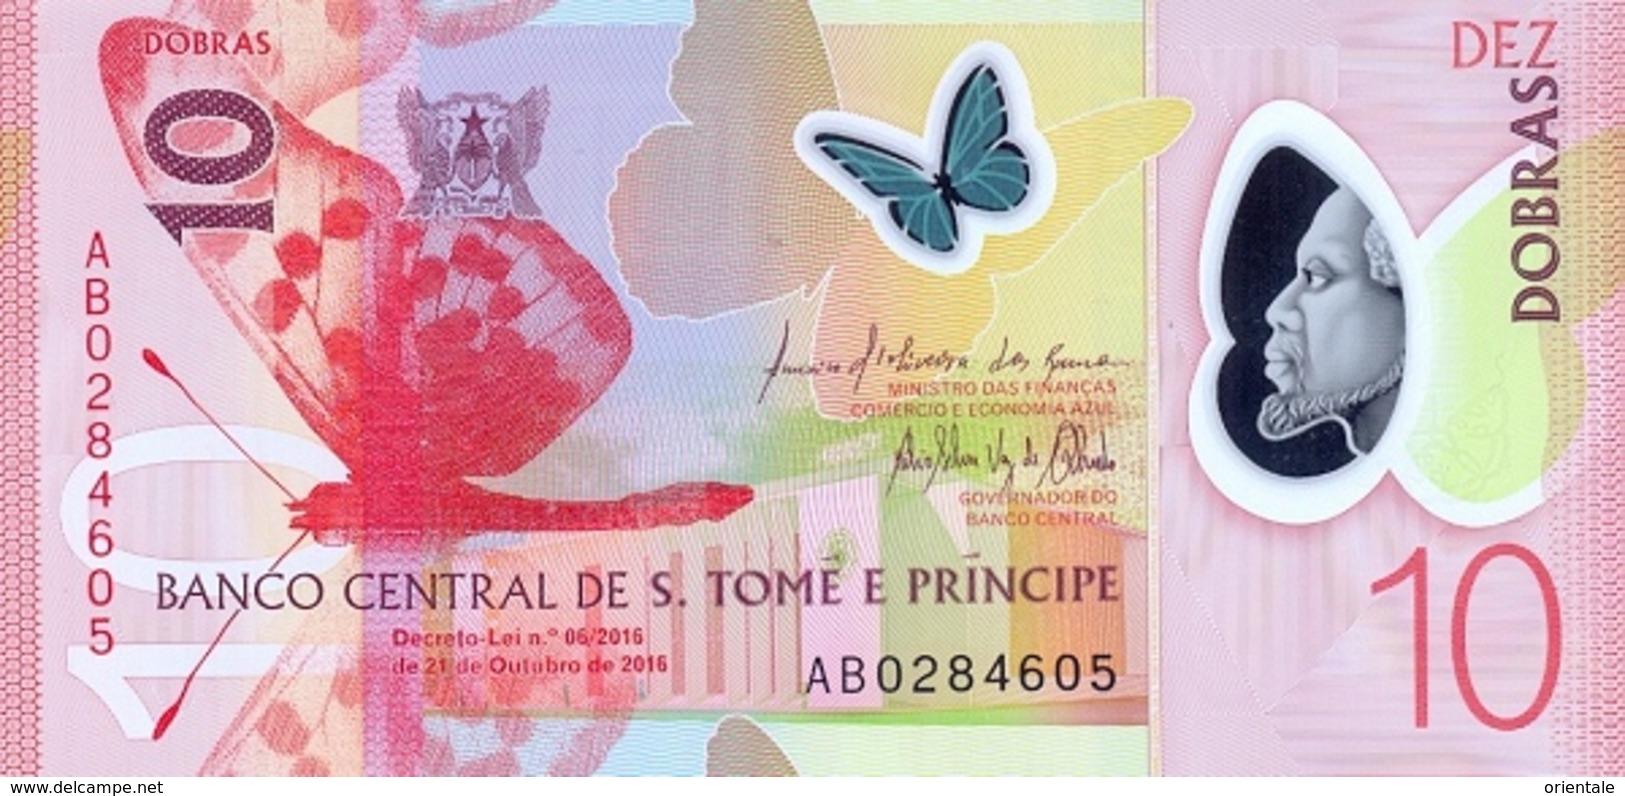 SAO TOME E PRINCIPE P. 71 10 D 2016 UNC - Sao Tome And Principe